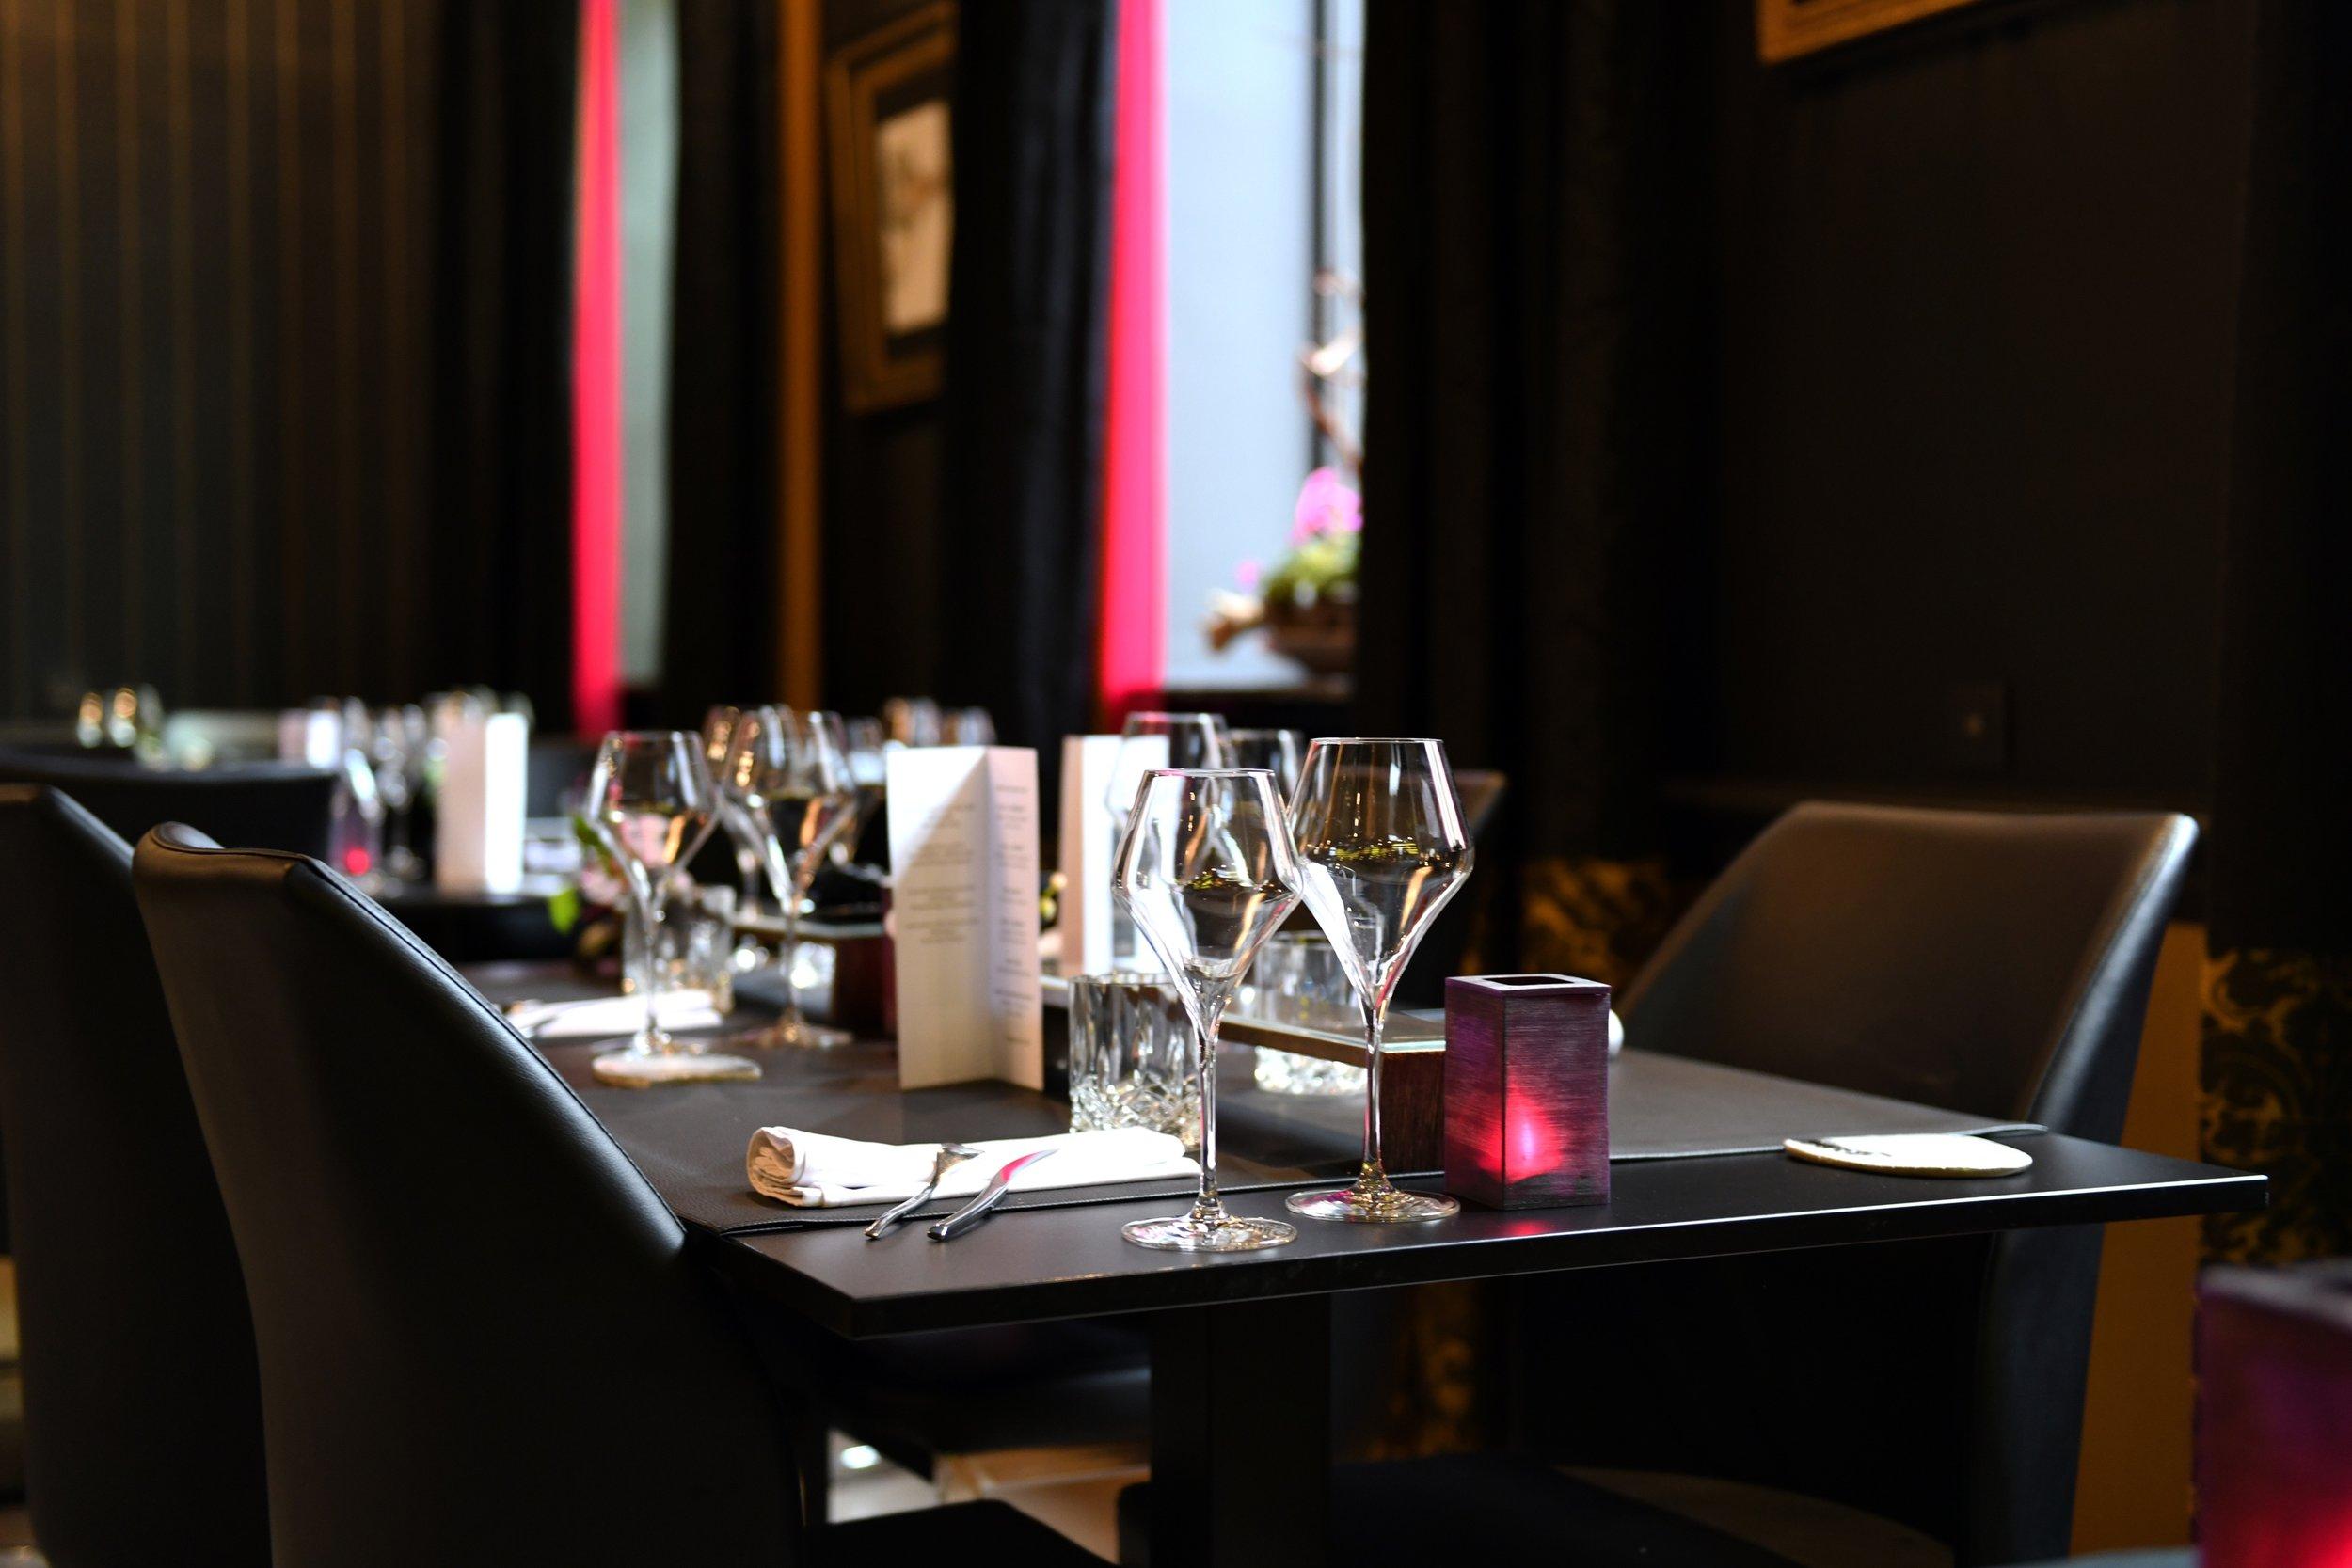 7 restaurant brasserie oud notarishuis ninove bart albrecht tablefever .jpg